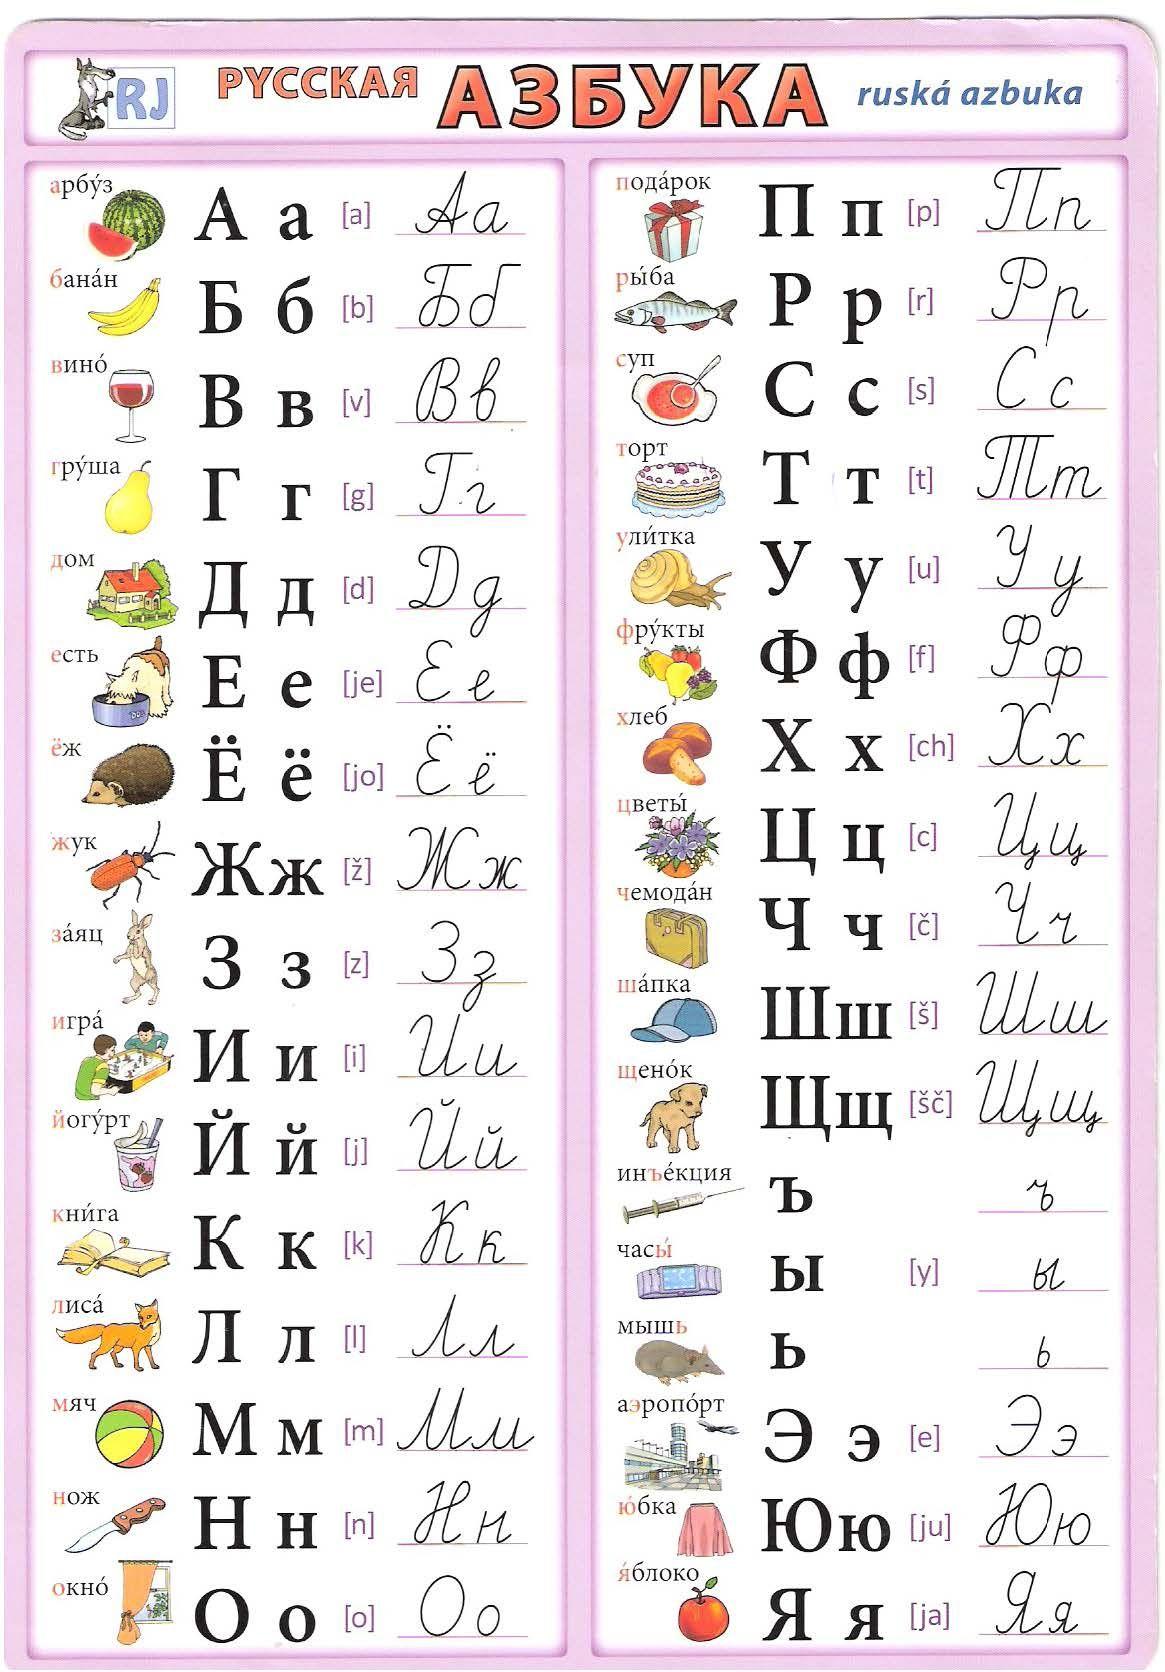 P Russian Alphabet Ruska Azbuka